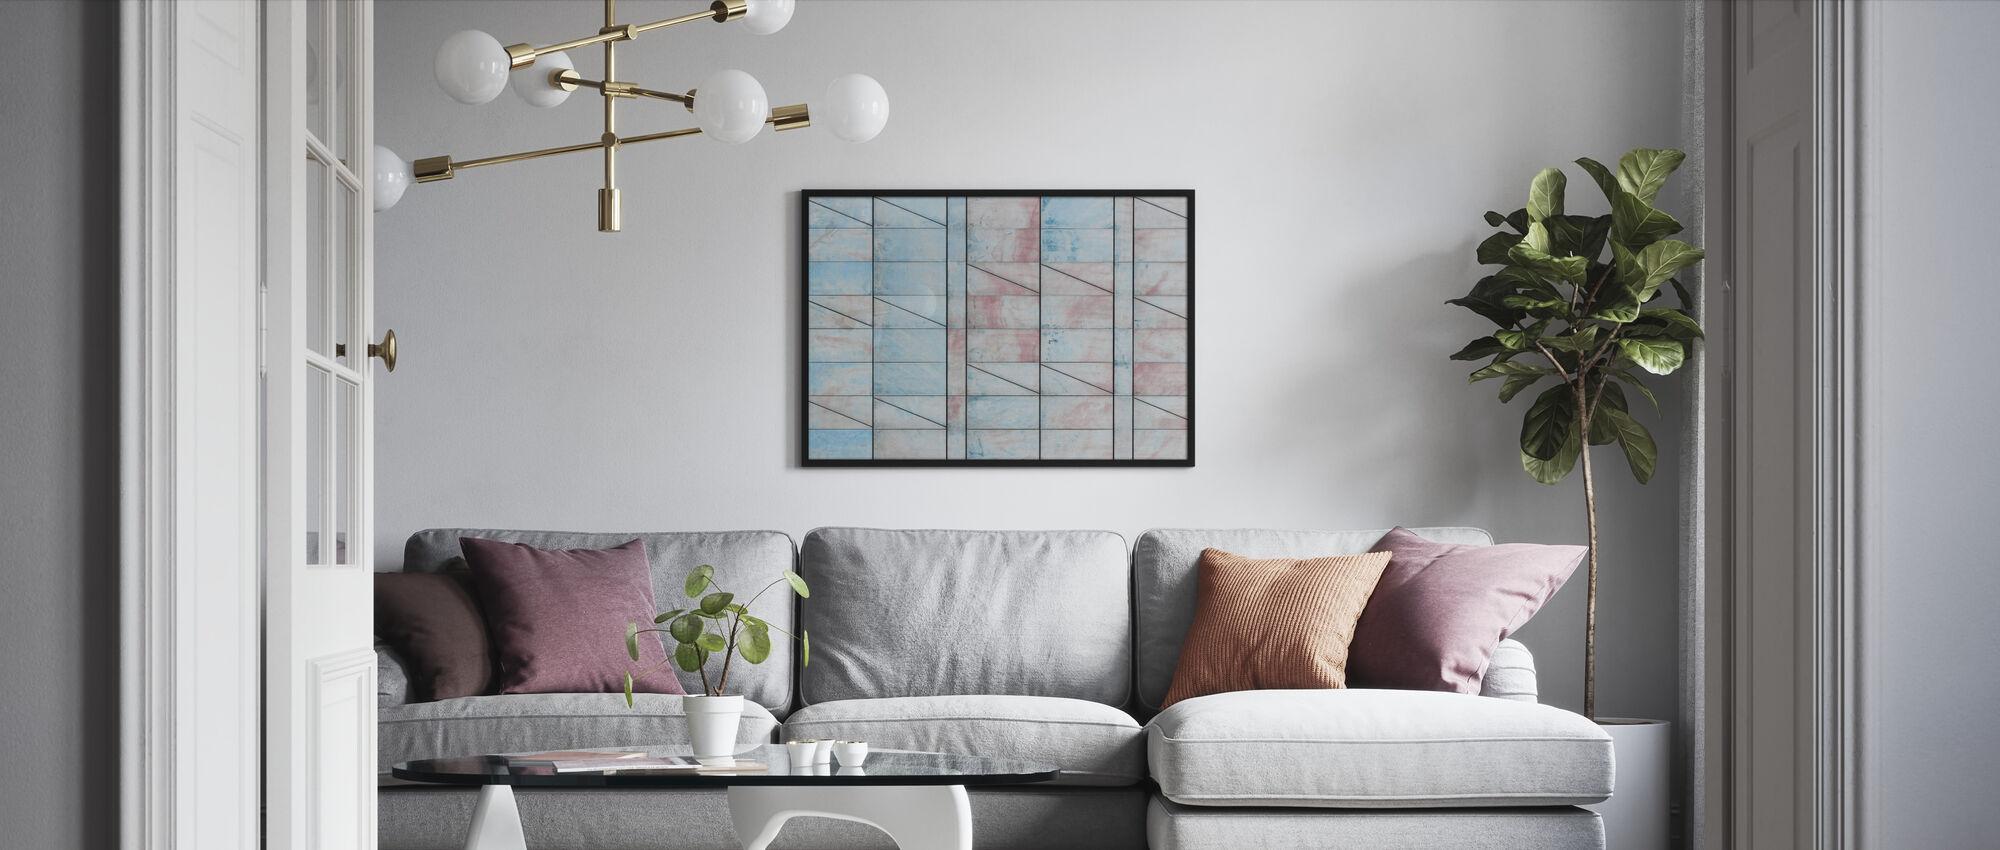 Blue and Red Tiles - Framed print - Living Room